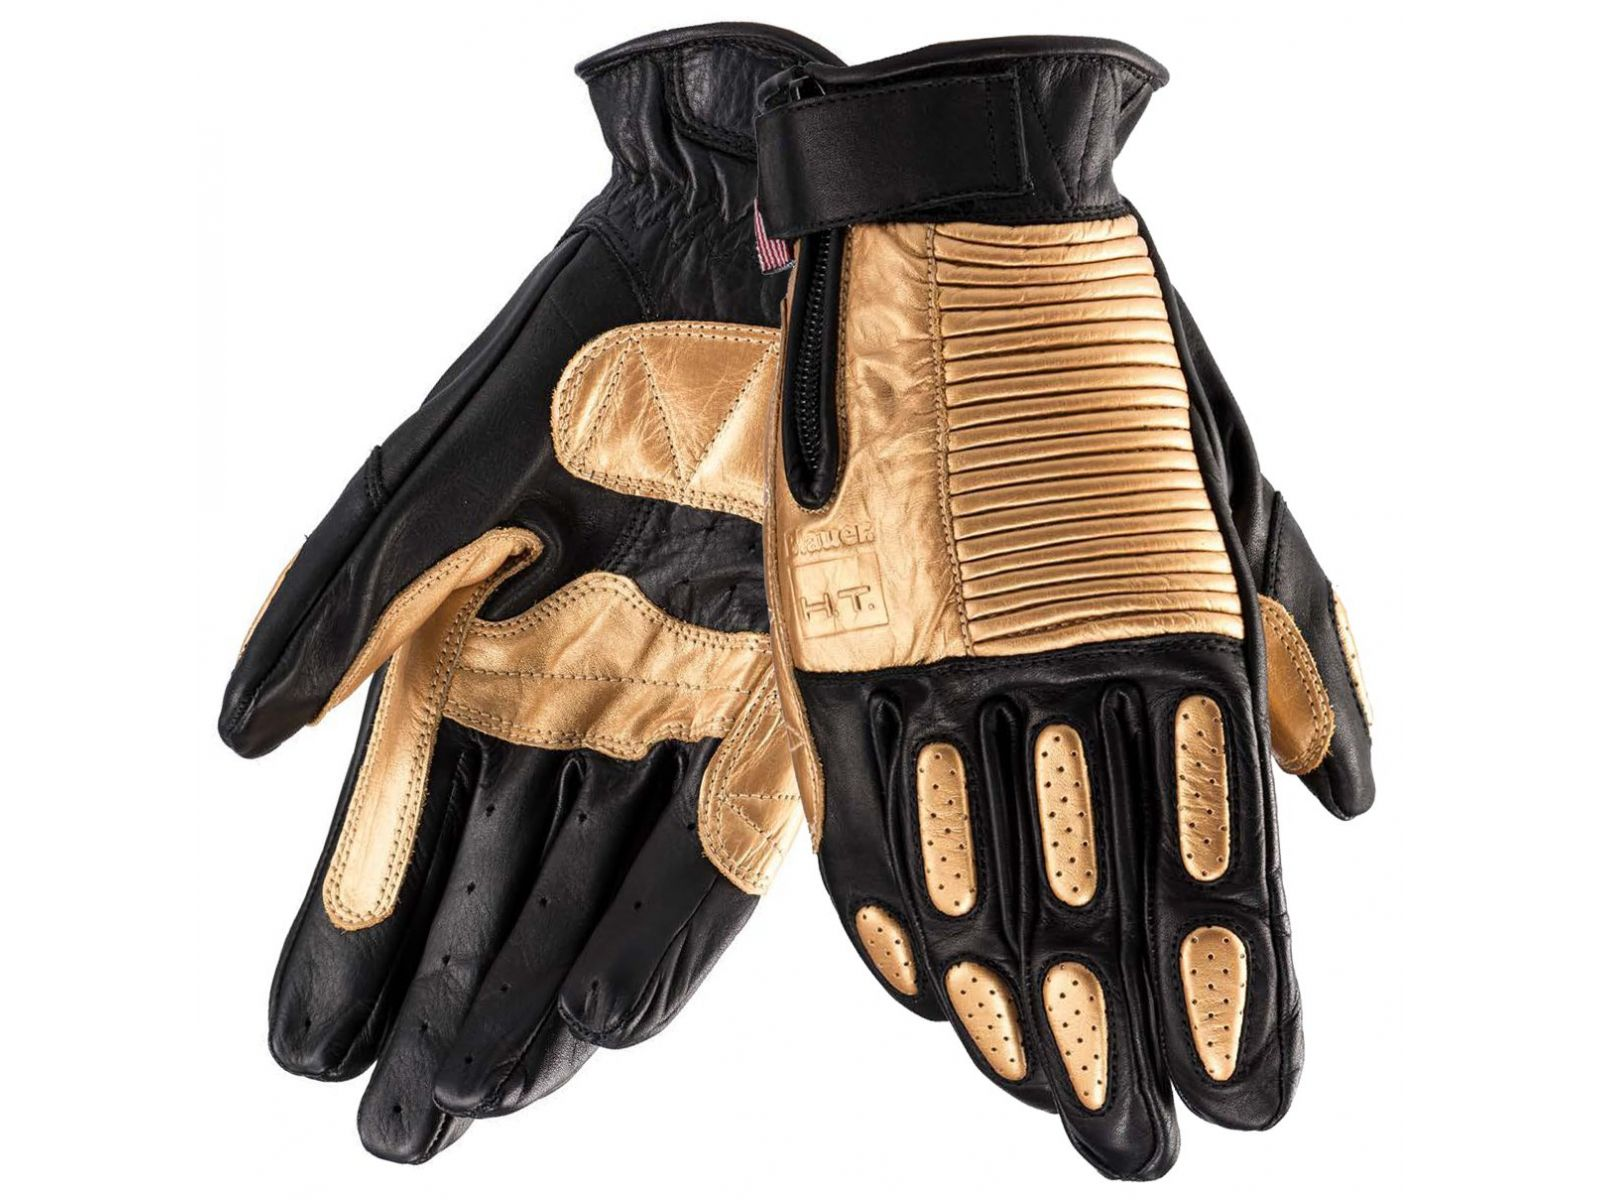 Мотоперчатки Blauer H.T. Banner Black Gold